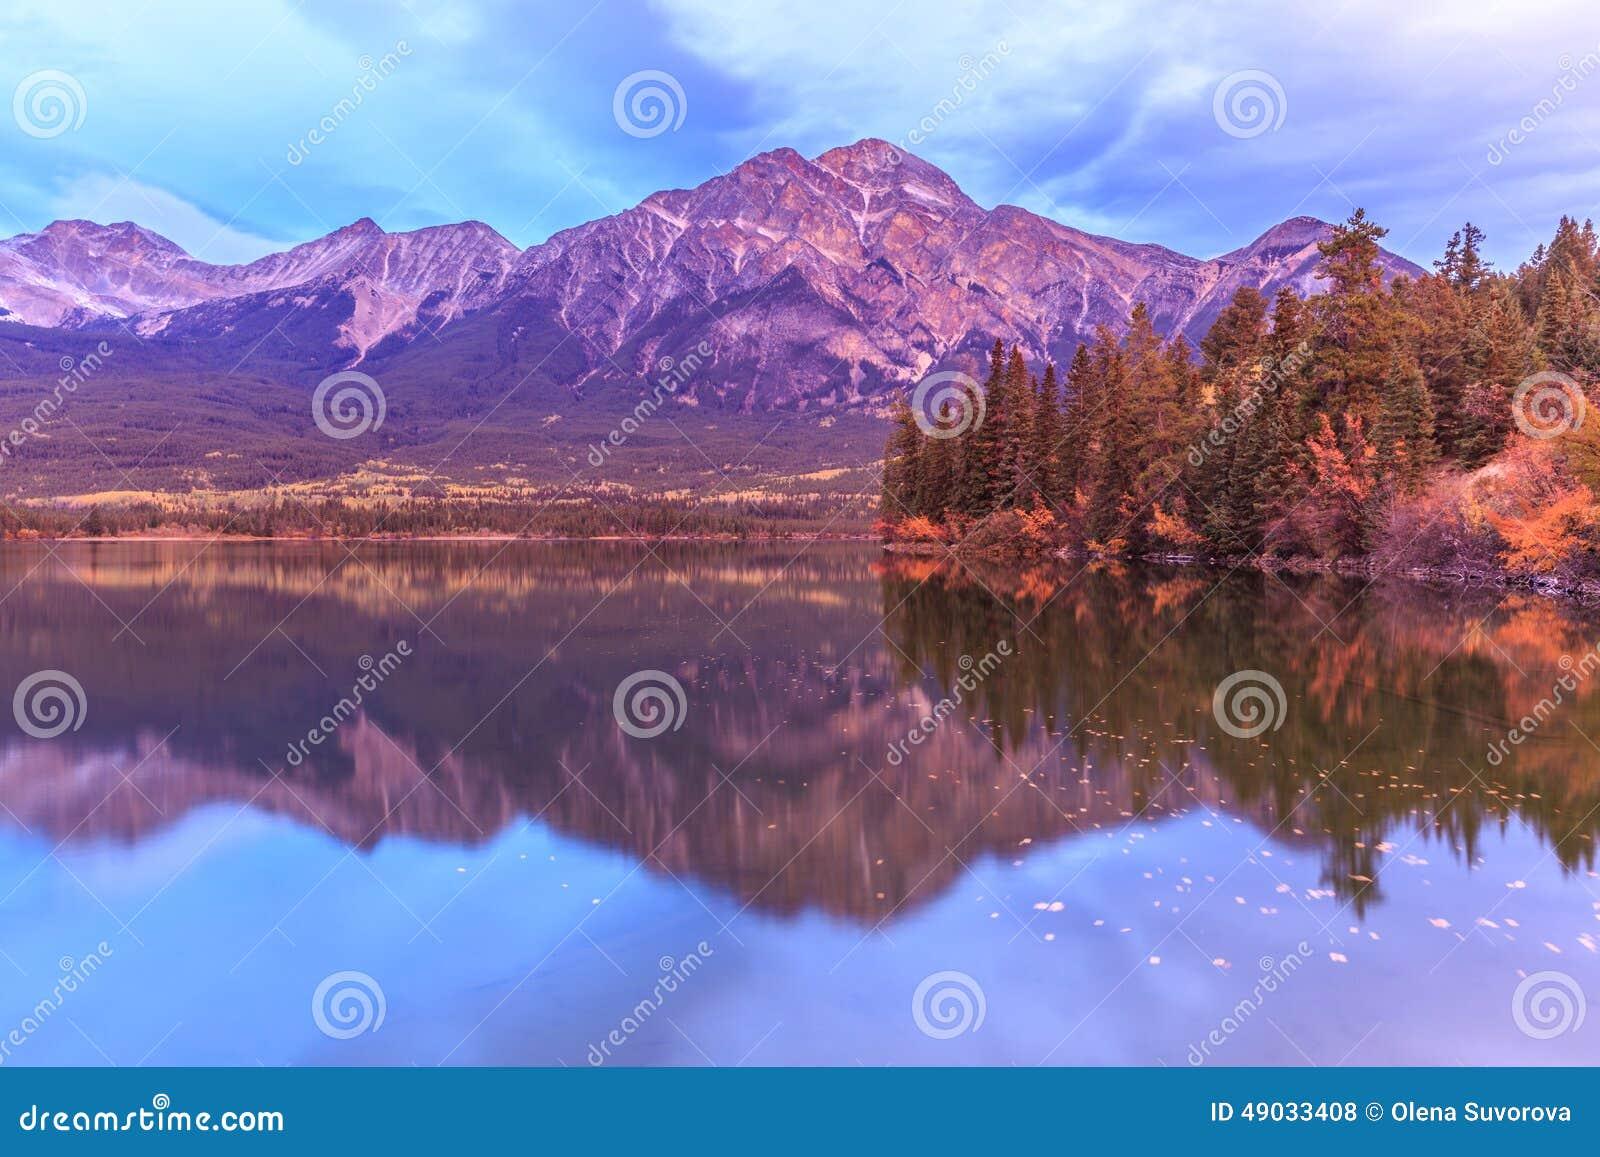 Lac pyramid en jaspe, Alberta, Canada